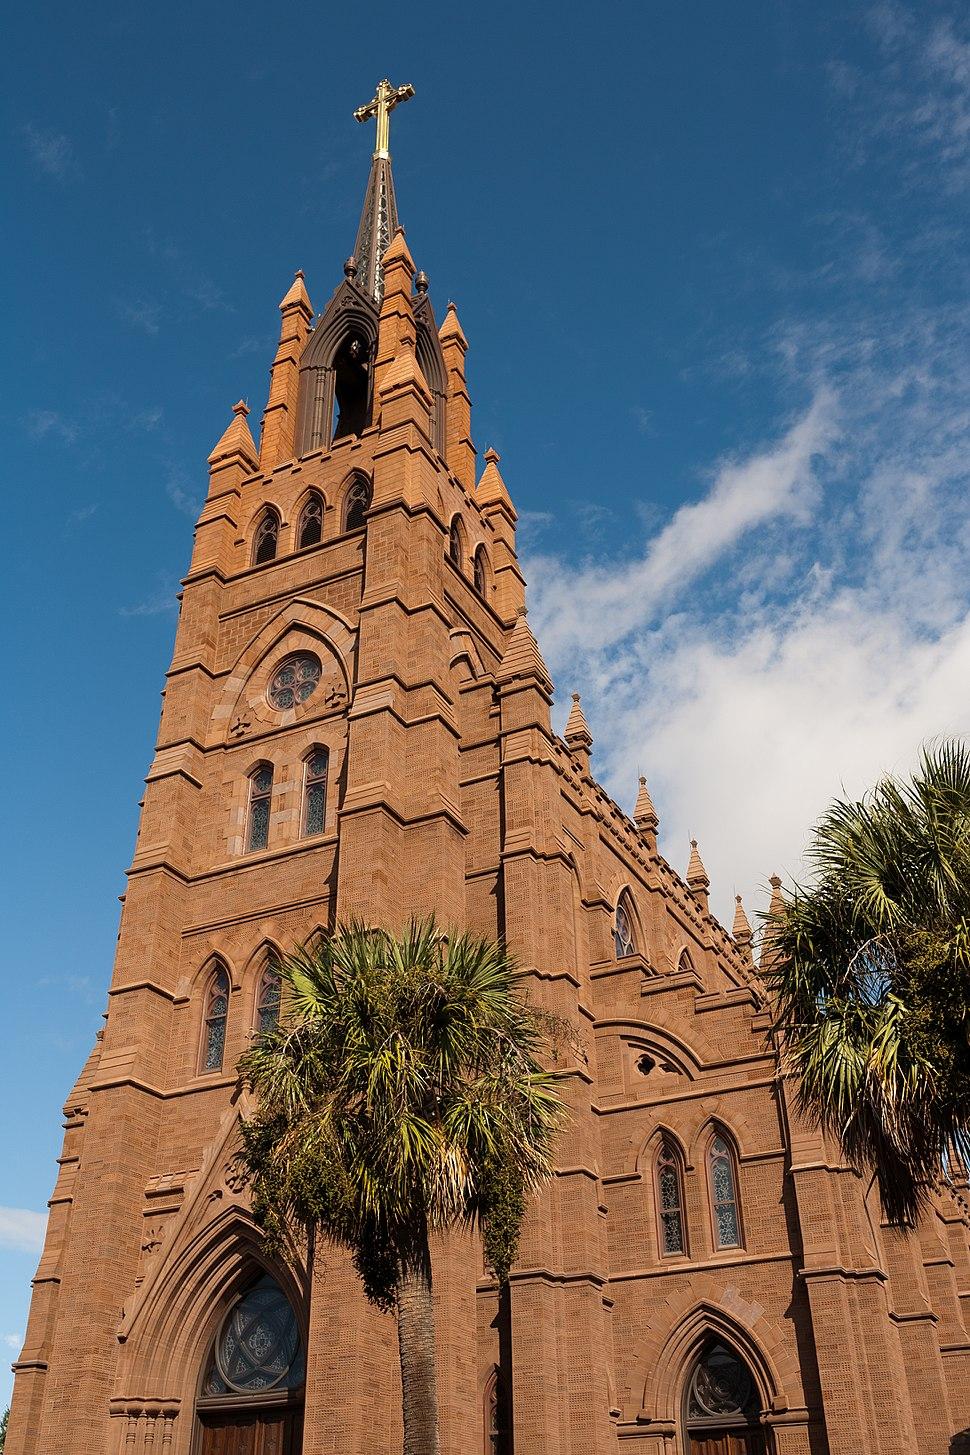 Cathedral of St. John the Baptist Charleston SC